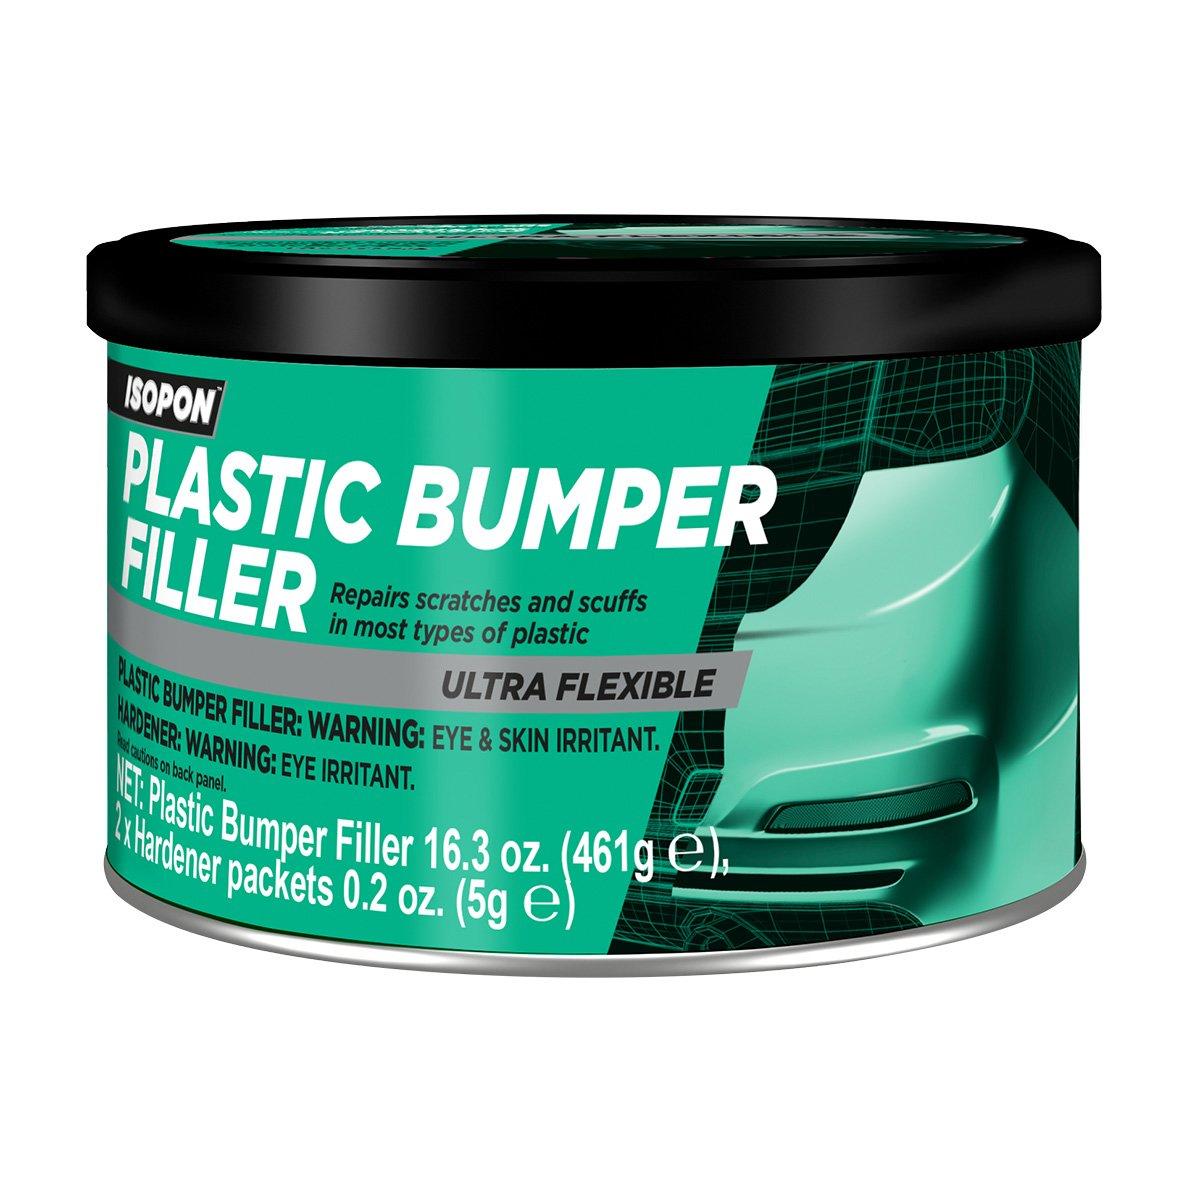 Isopon Plastic Bumper Filler Tin (16.3 Oz.) UP5016